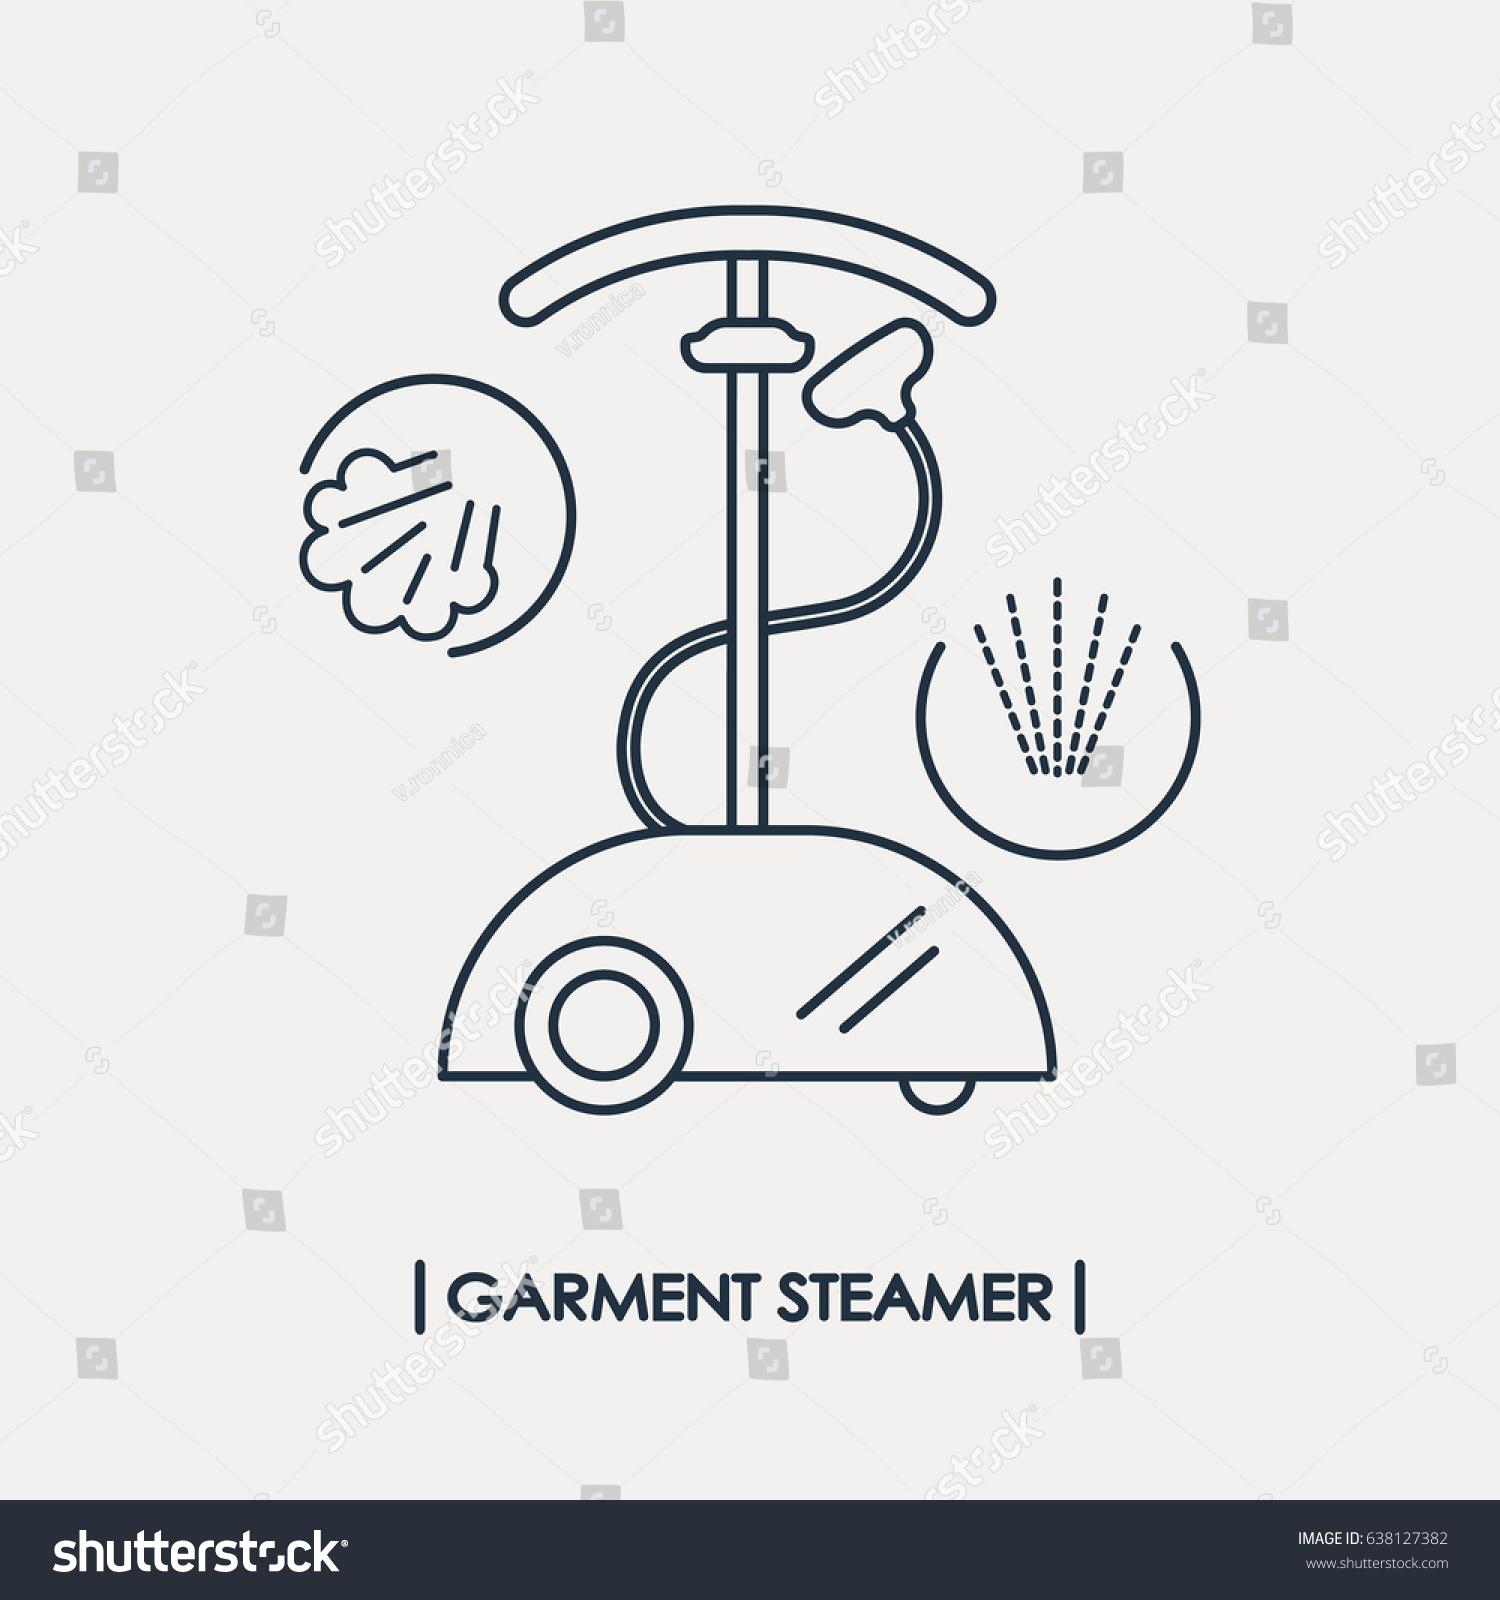 Line Style Garment Steamer Icon Outline Stock Vector